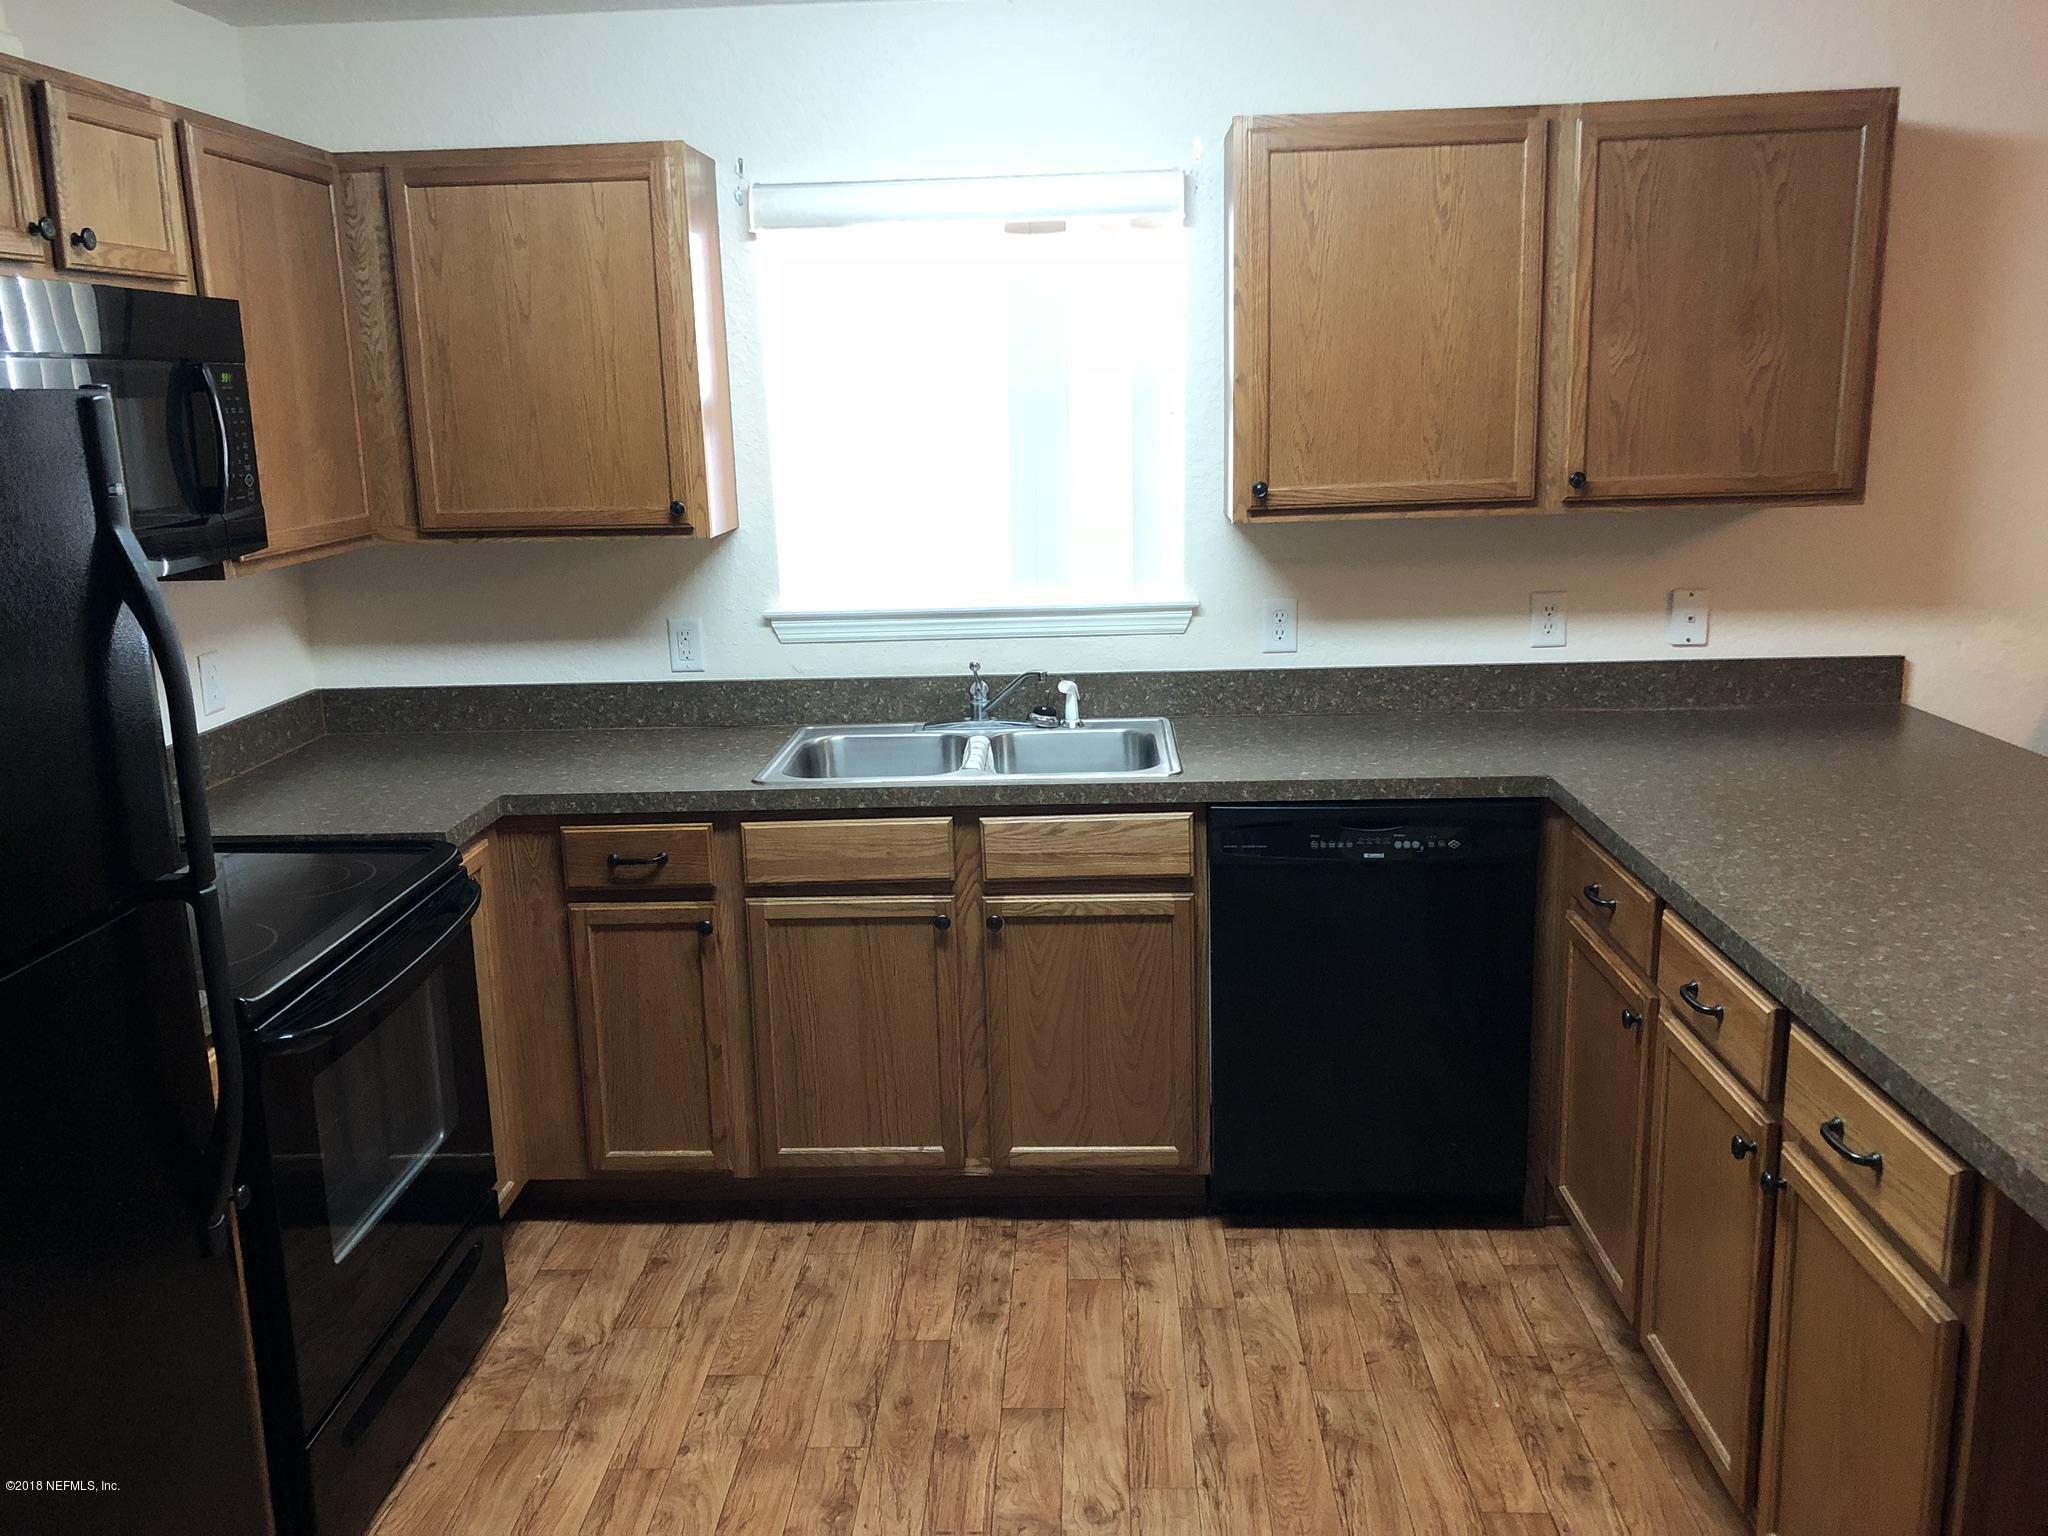 820 JOSIAH, ST AUGUSTINE, FLORIDA 32084, 3 Bedrooms Bedrooms, ,2 BathroomsBathrooms,Residential - single family,For sale,JOSIAH,954070